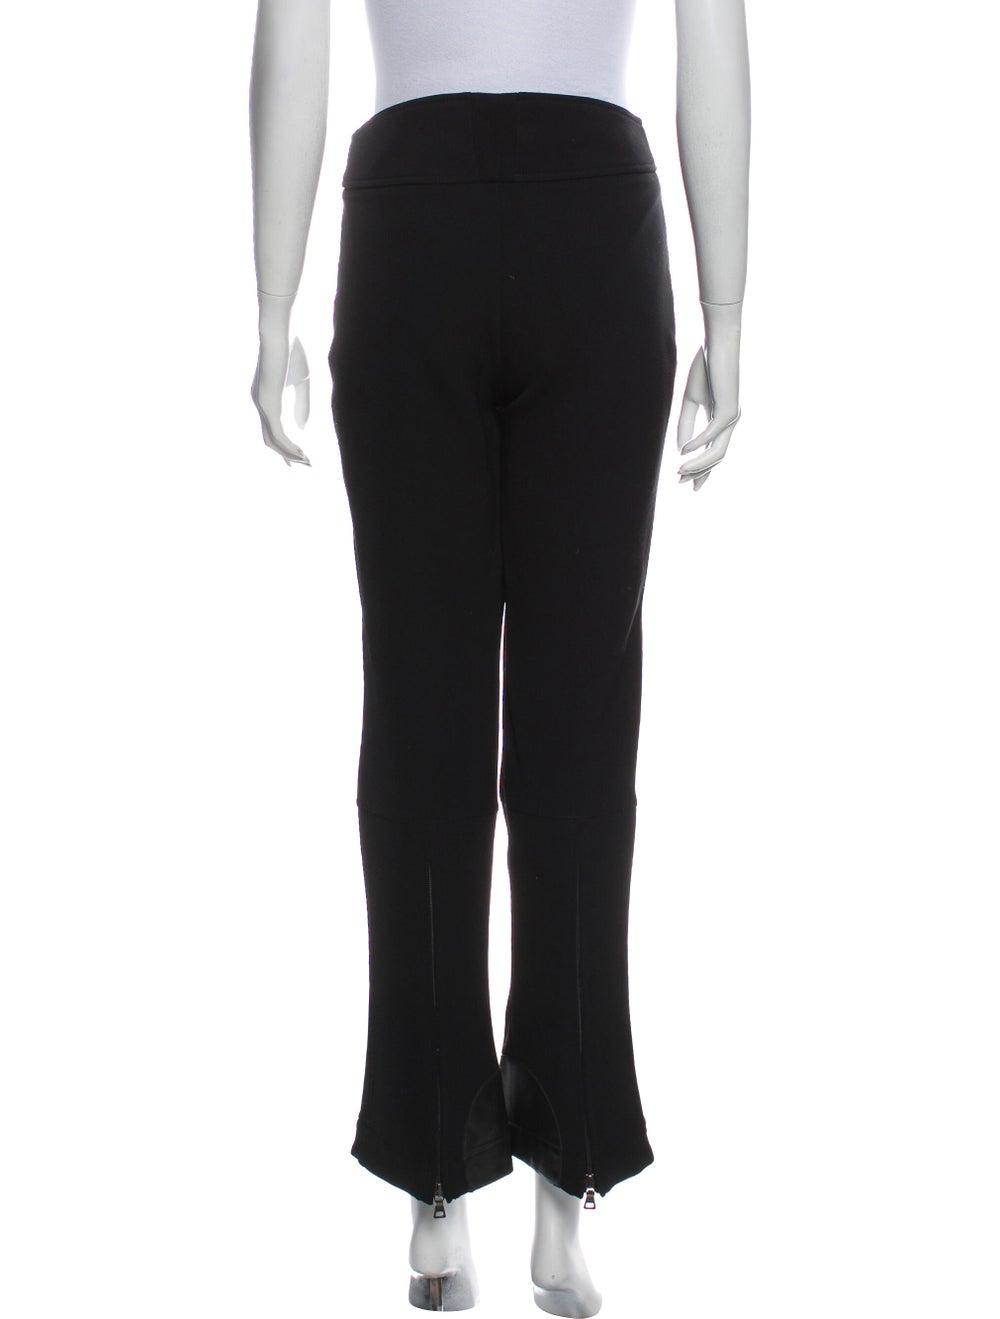 Prada Sport Straight Leg Pants Black - image 3